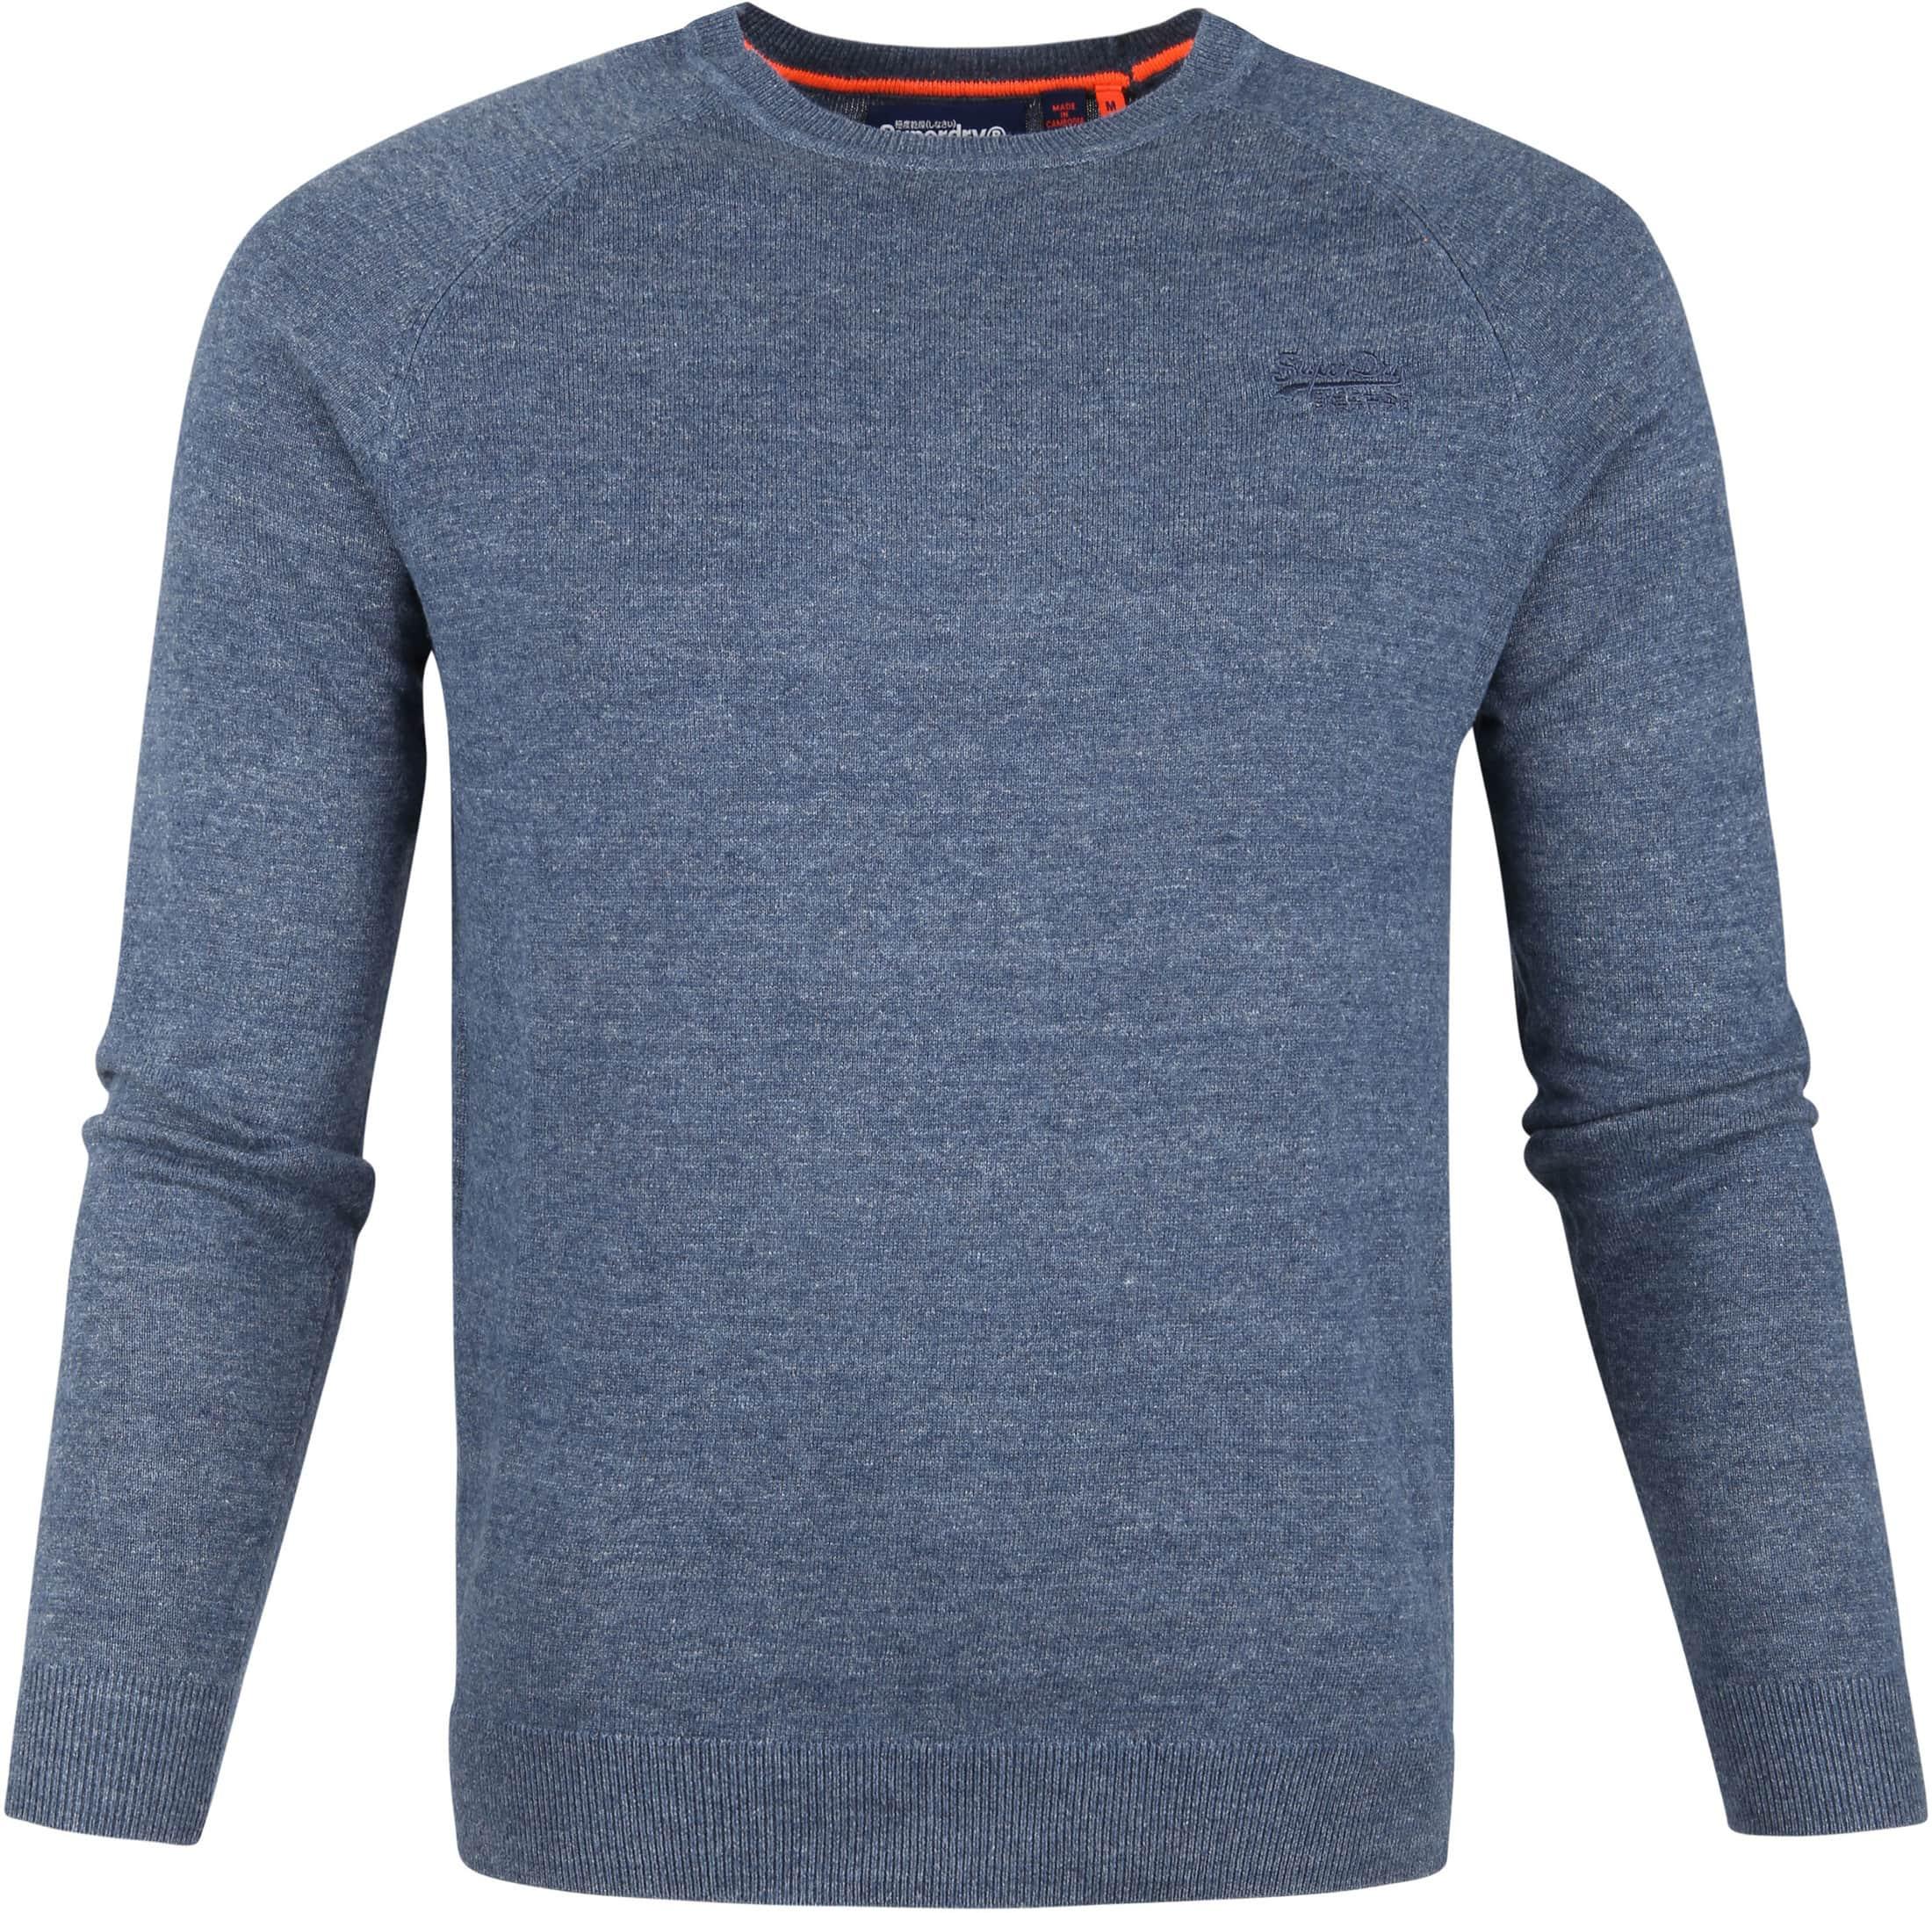 Superdry Pullover Blauw foto 0